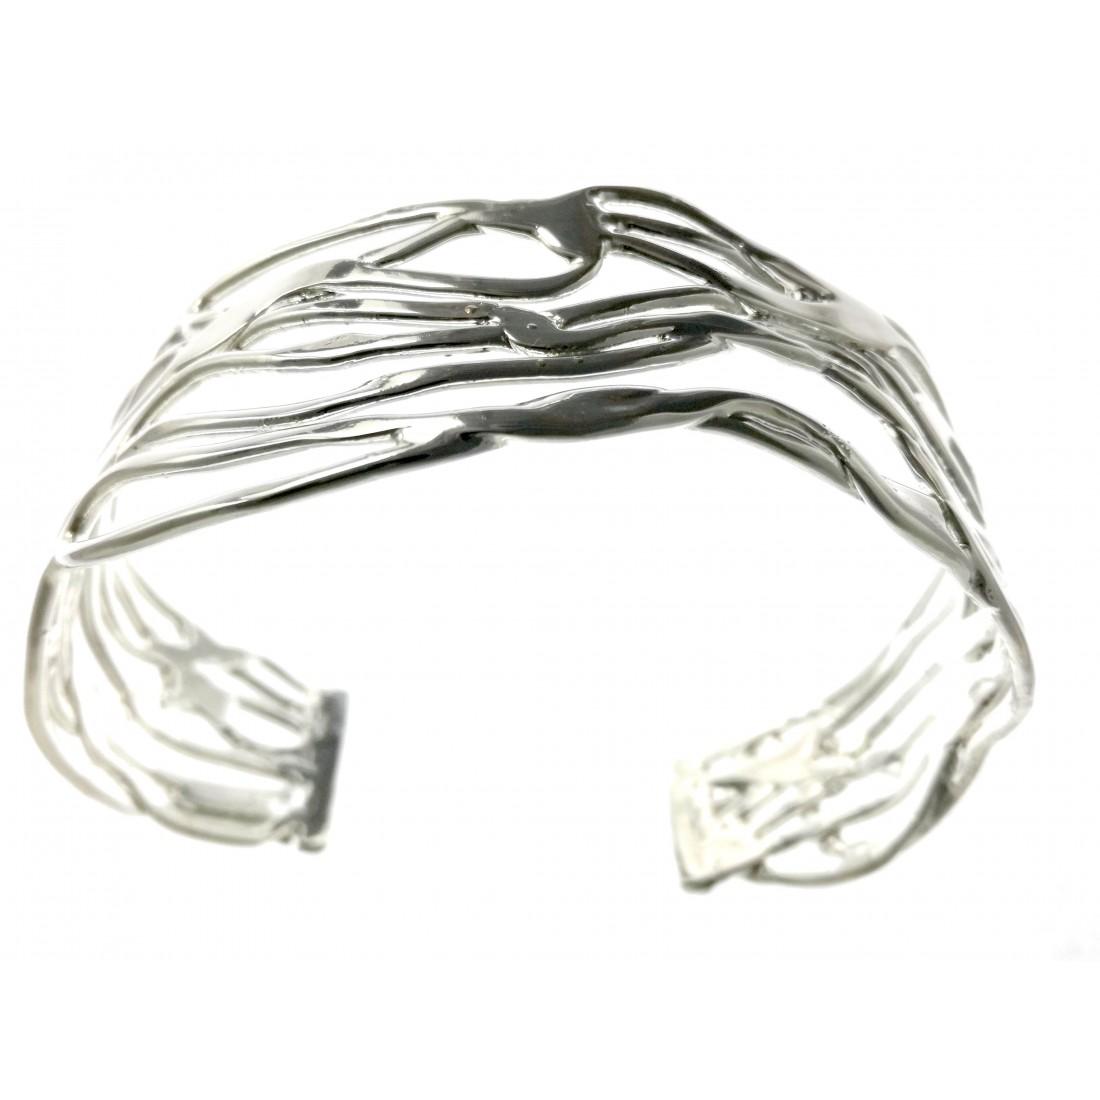 Bracelet unique-bijou made in France-création artisanale